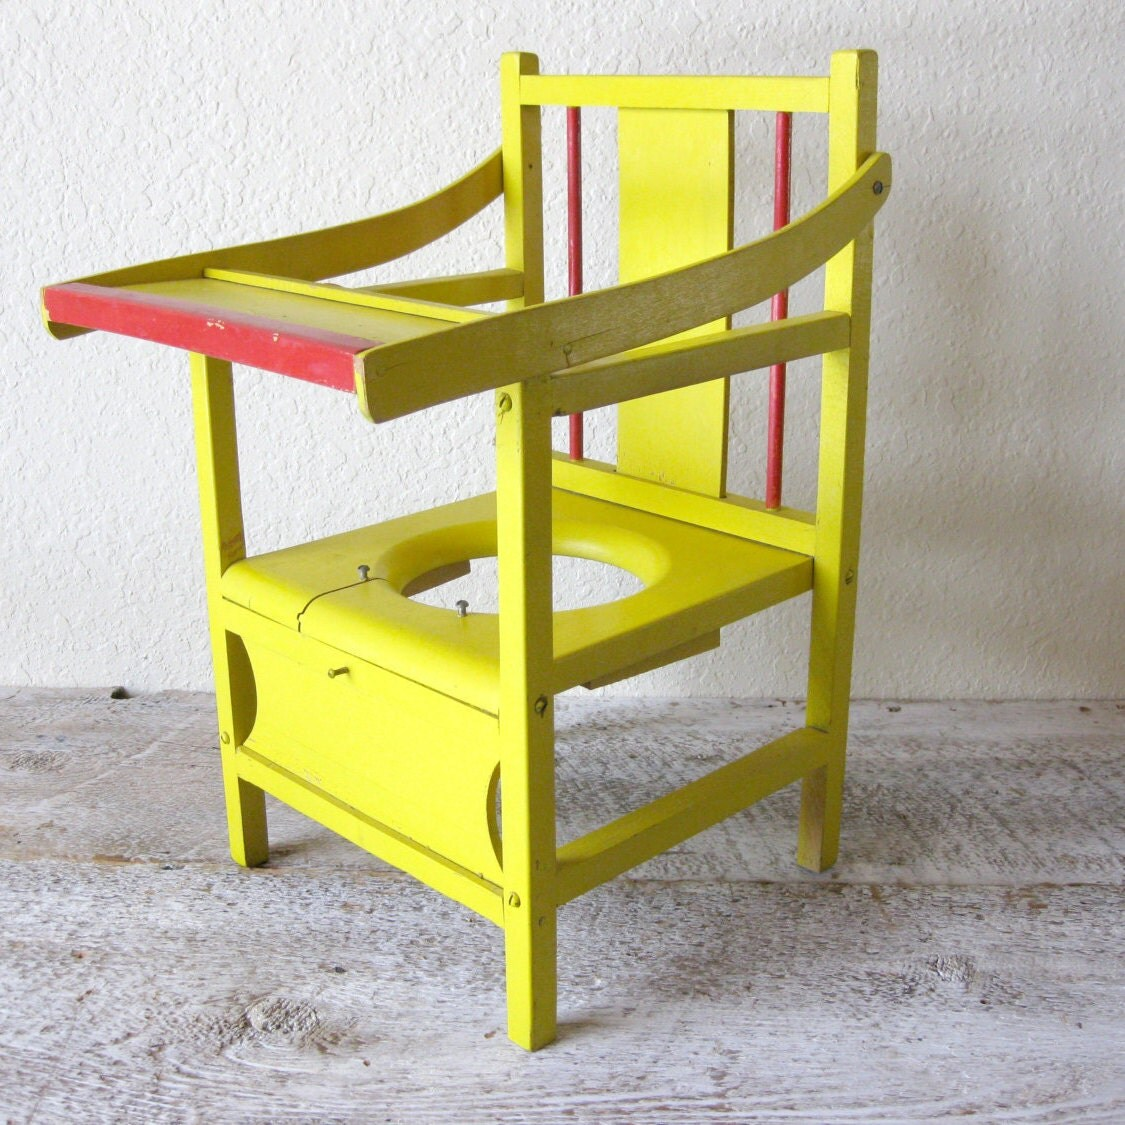 Antique Wood Child's Potty Chair Planter